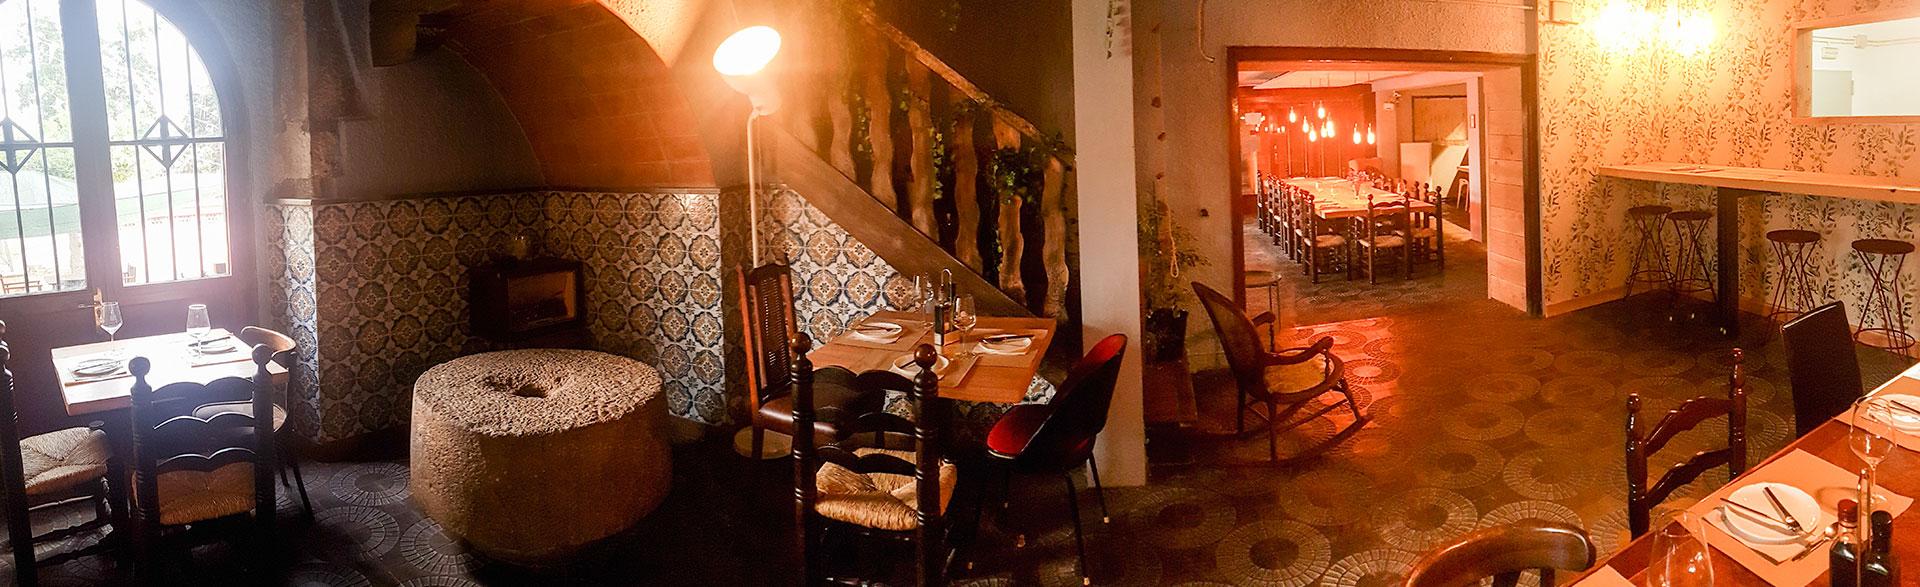 @terrarestaurant_gorchs, Restaurant Ecologic Terra Km0 El Gorchs Granollers